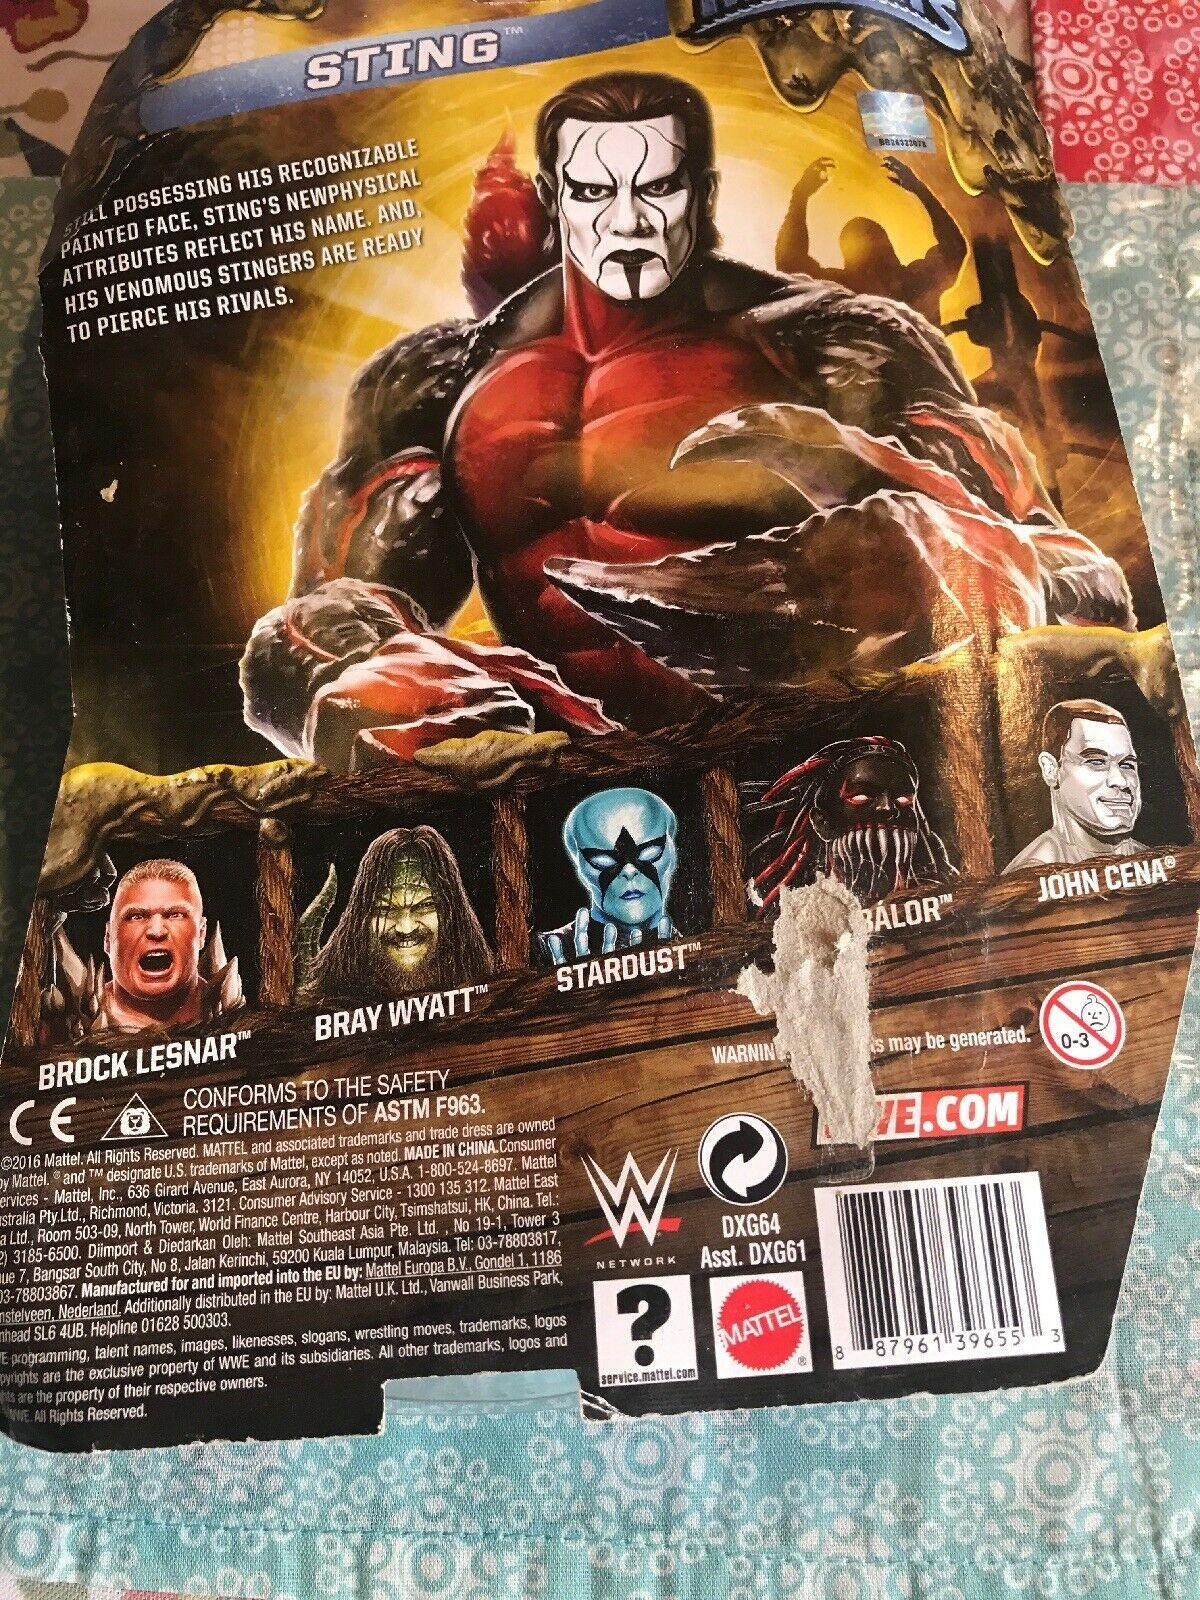 2016 WWE WWF Mattel Sting Scorpion Mutants Wrestling Figure MOC WCW NWO NWA